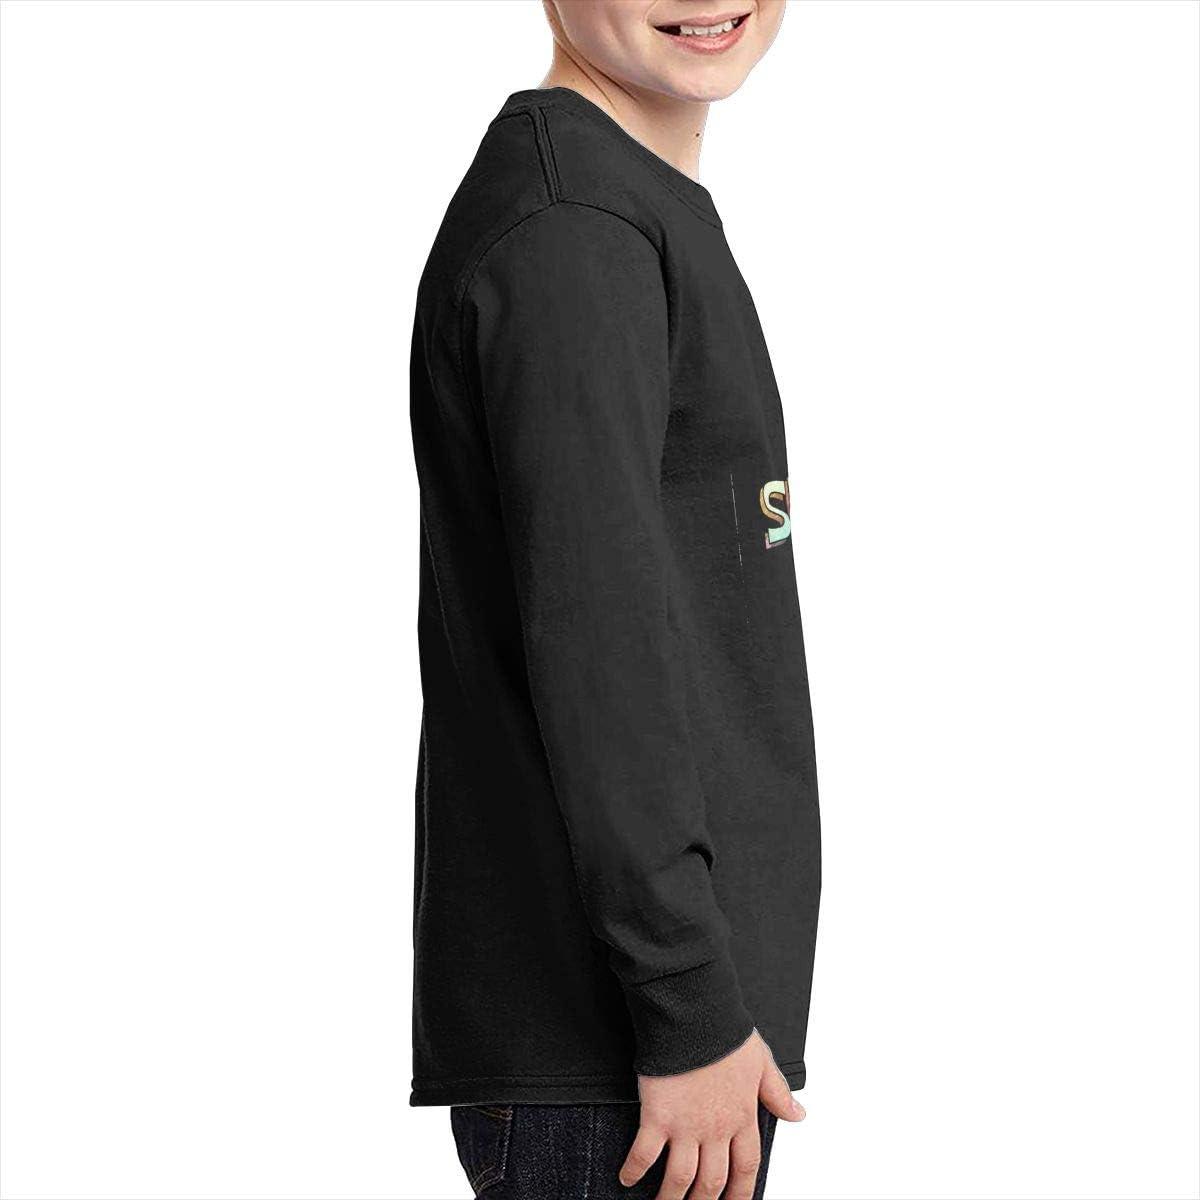 YOILLY Spongebob Time Passing Junior Long Sleeve T-Shirt Boys Long Sleeve Round Neck Graphic Tees Black